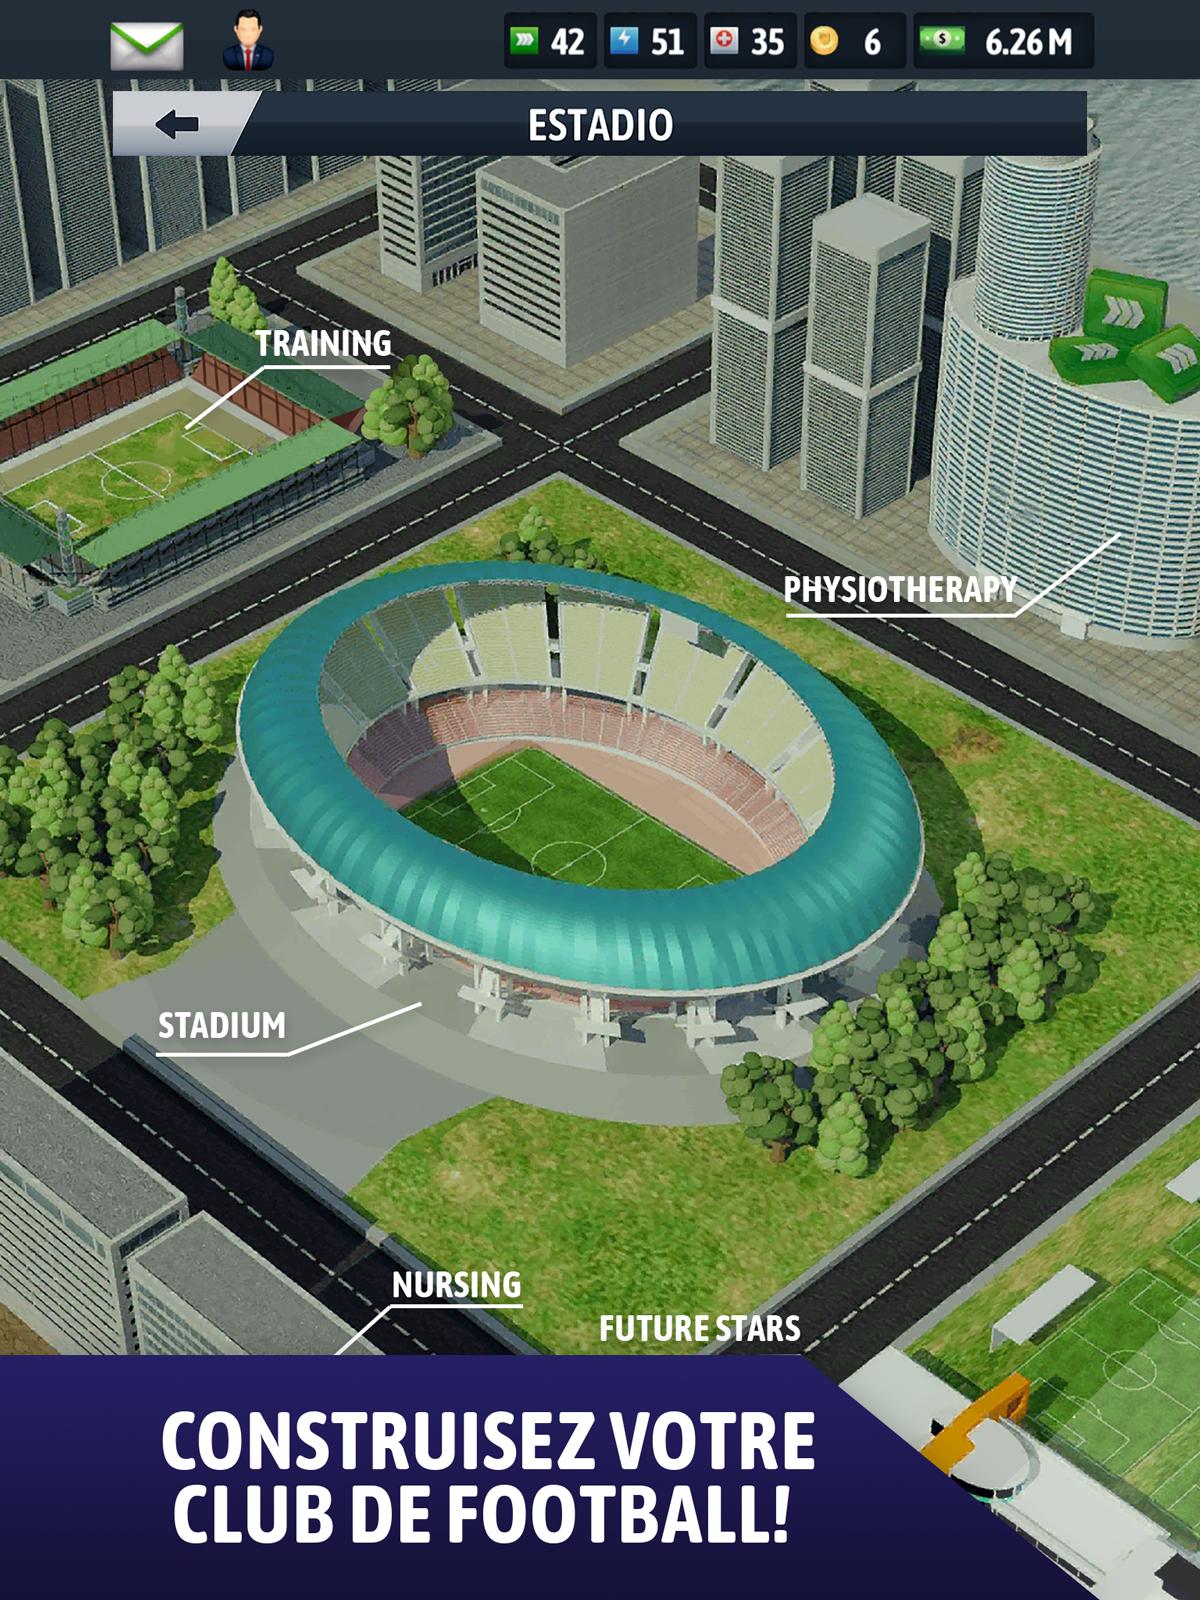 BeSoccer Fantasy Football Manager capture d'écran 1